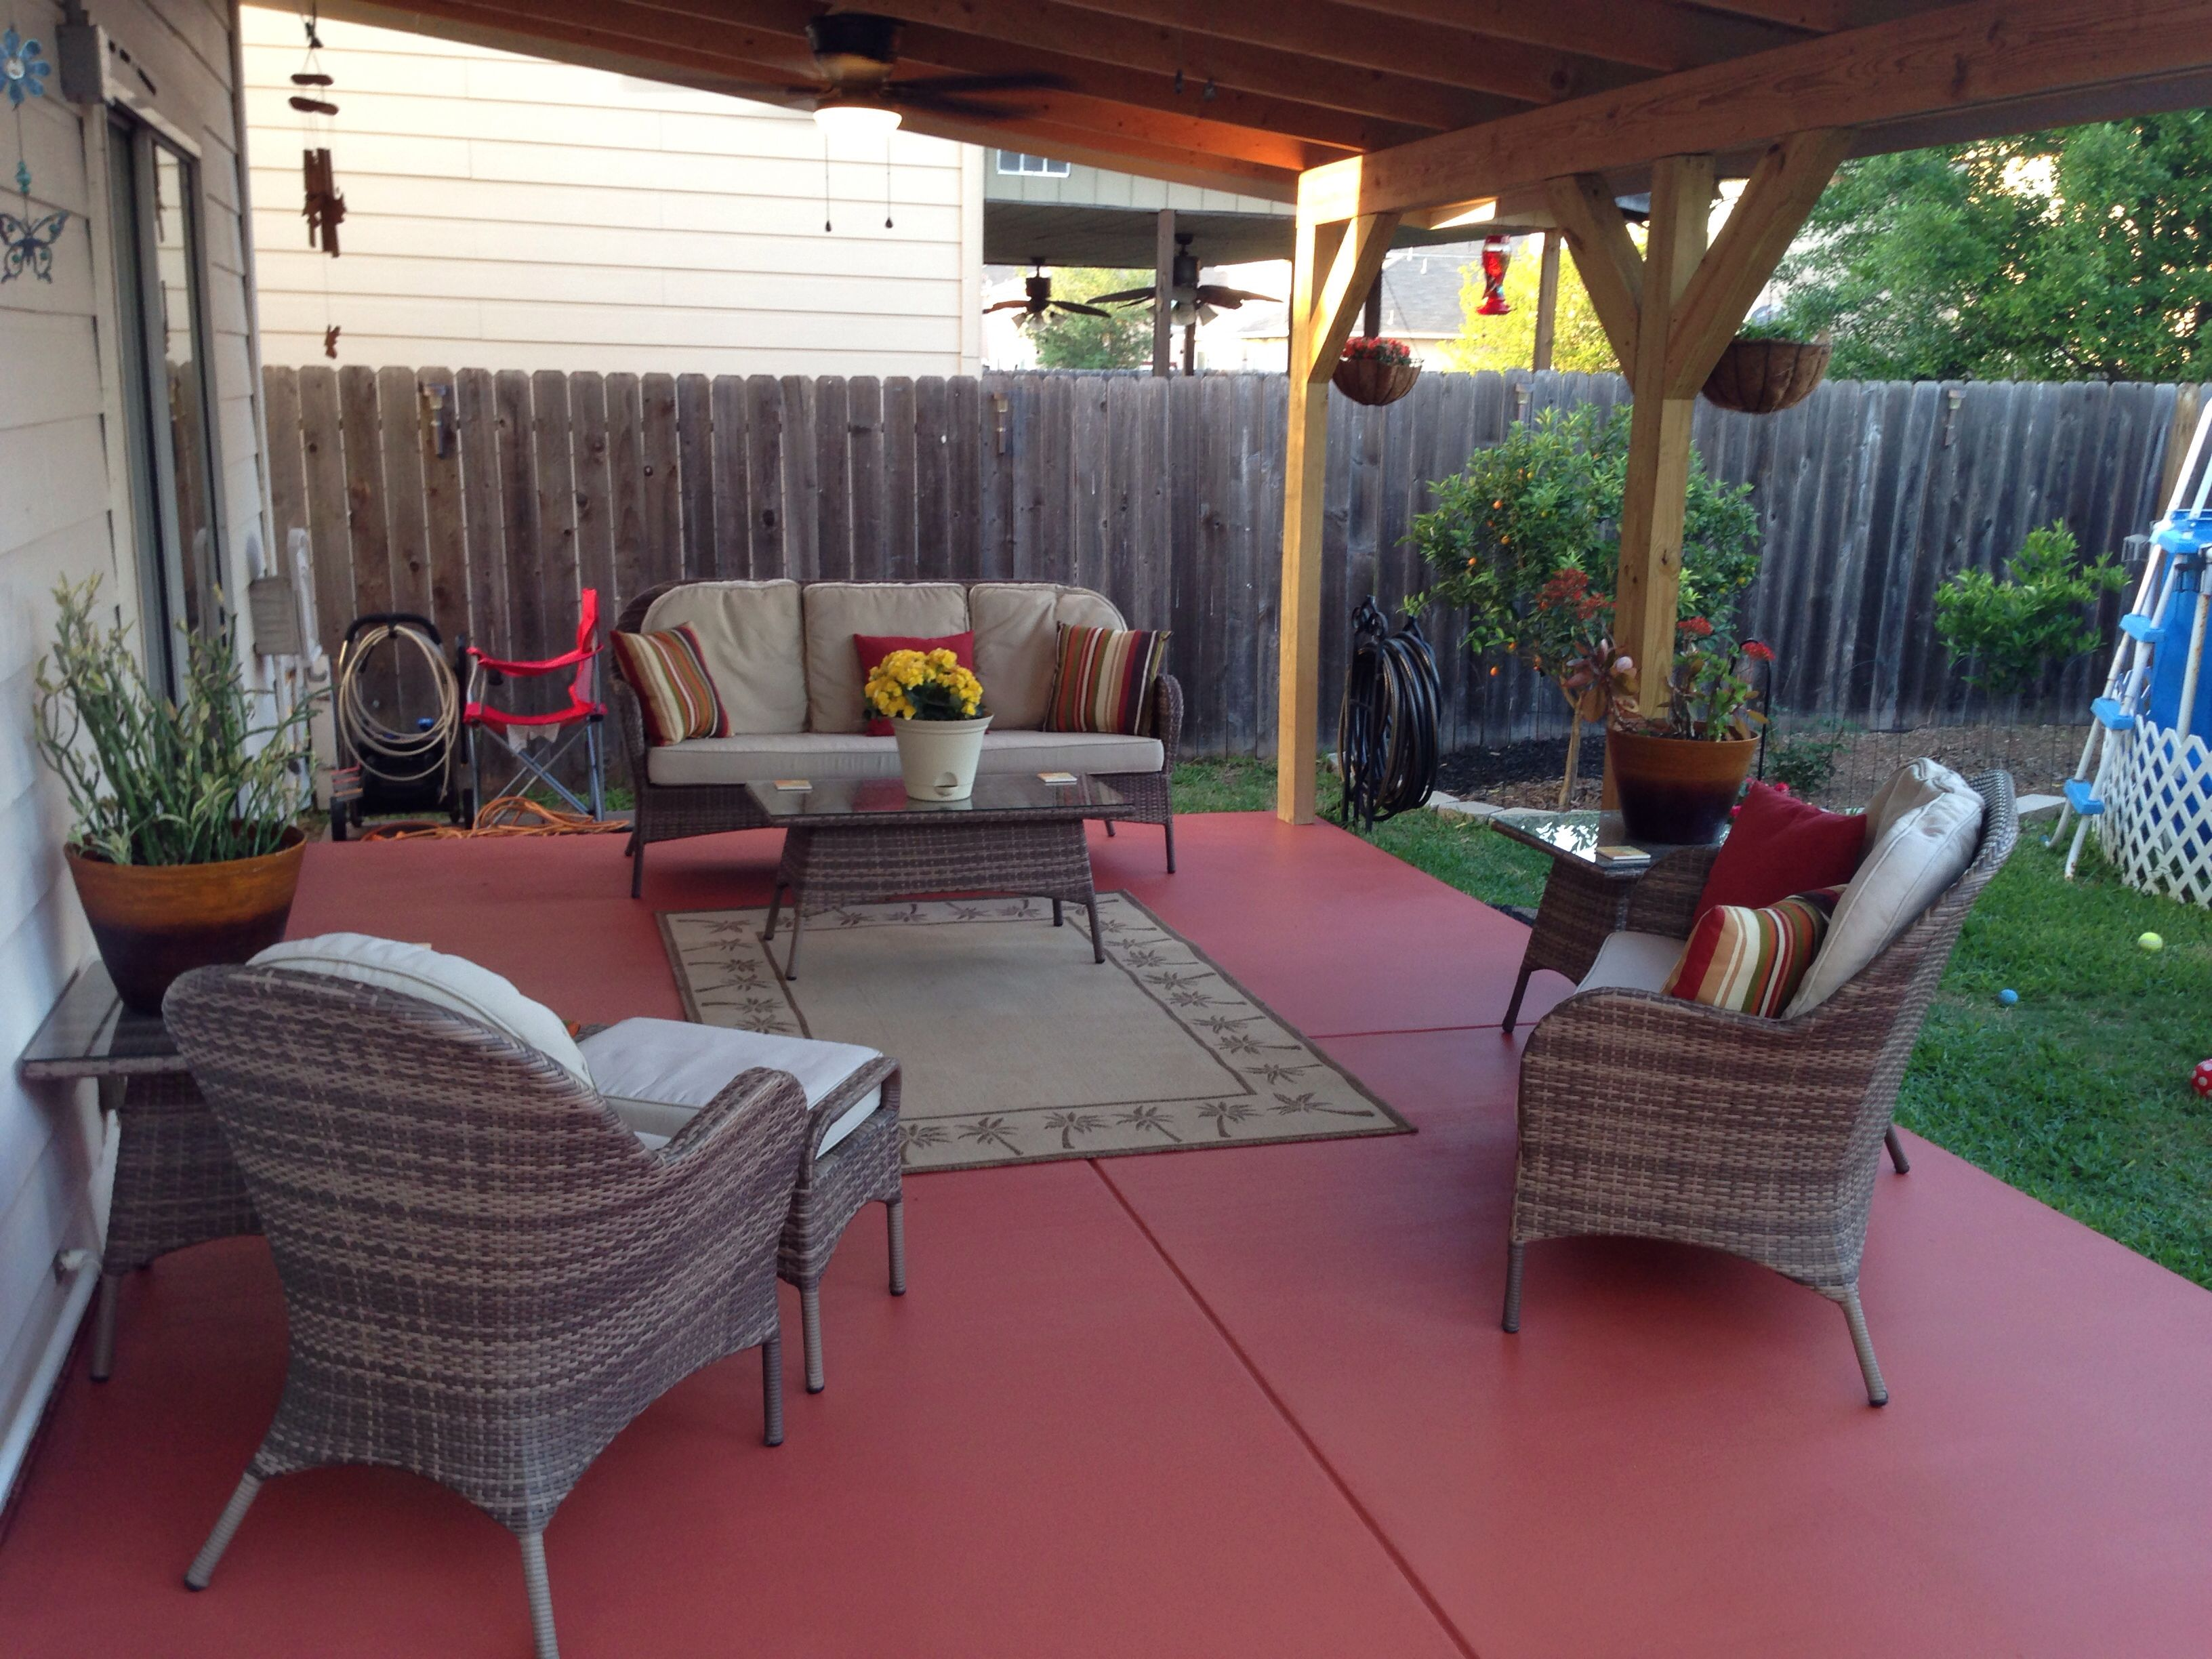 Valspar 3 3 L Garage Floor Coating Kit Carpet Vidalondon